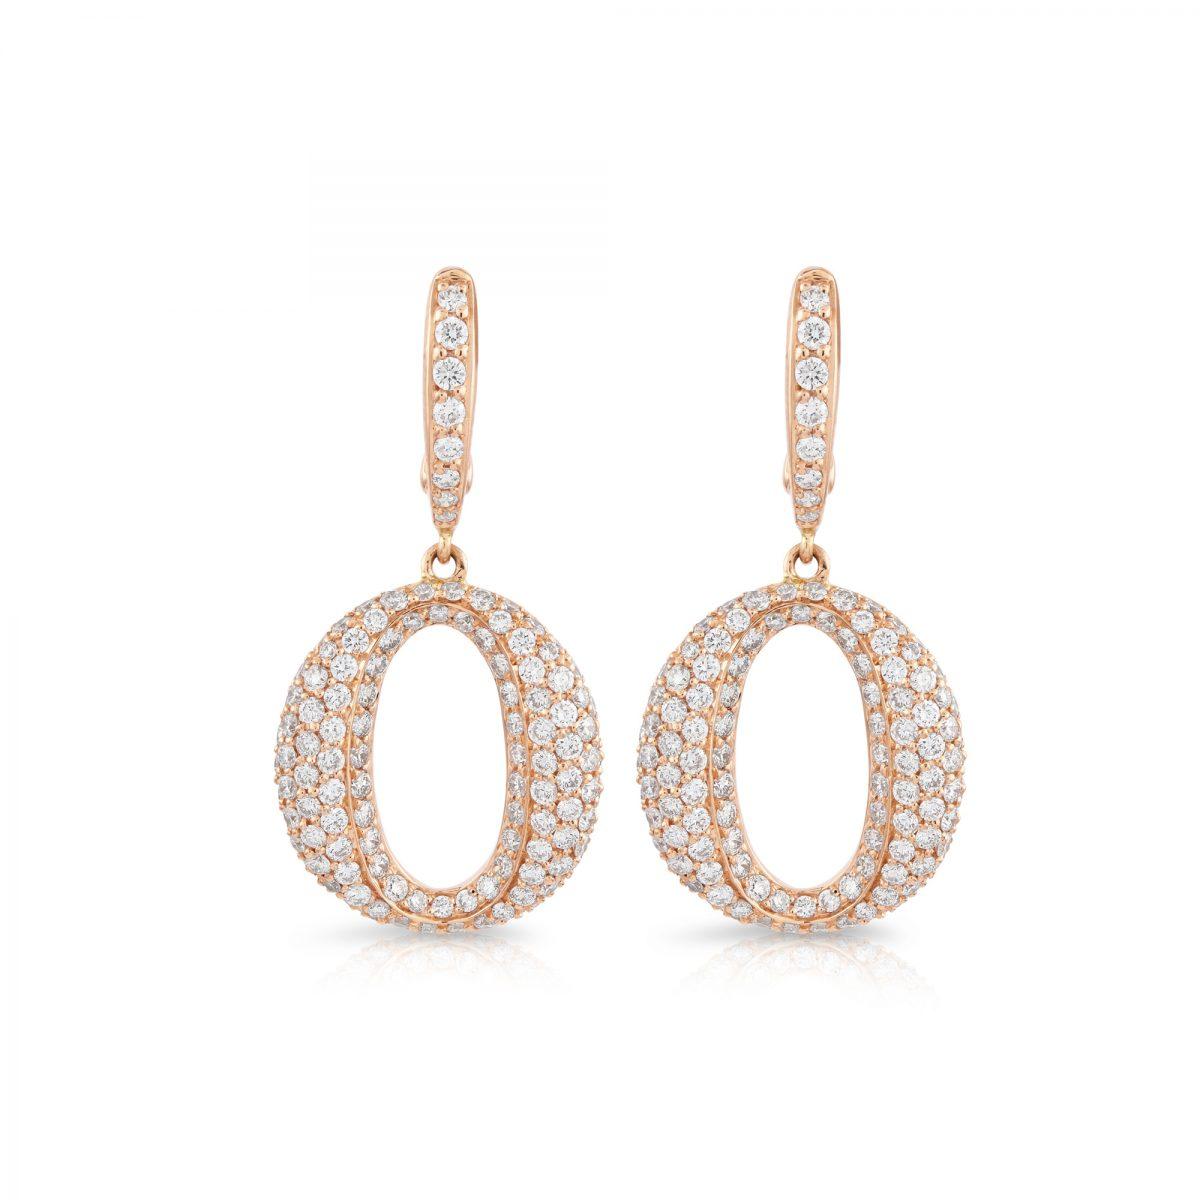 product/s/u/surround_earrings_30_28_669.jpg;;product/s/u/surround_earrings_30_28_669_l_s.jpg;;product/d/m/dmr-packaging_206_1_11.jpg